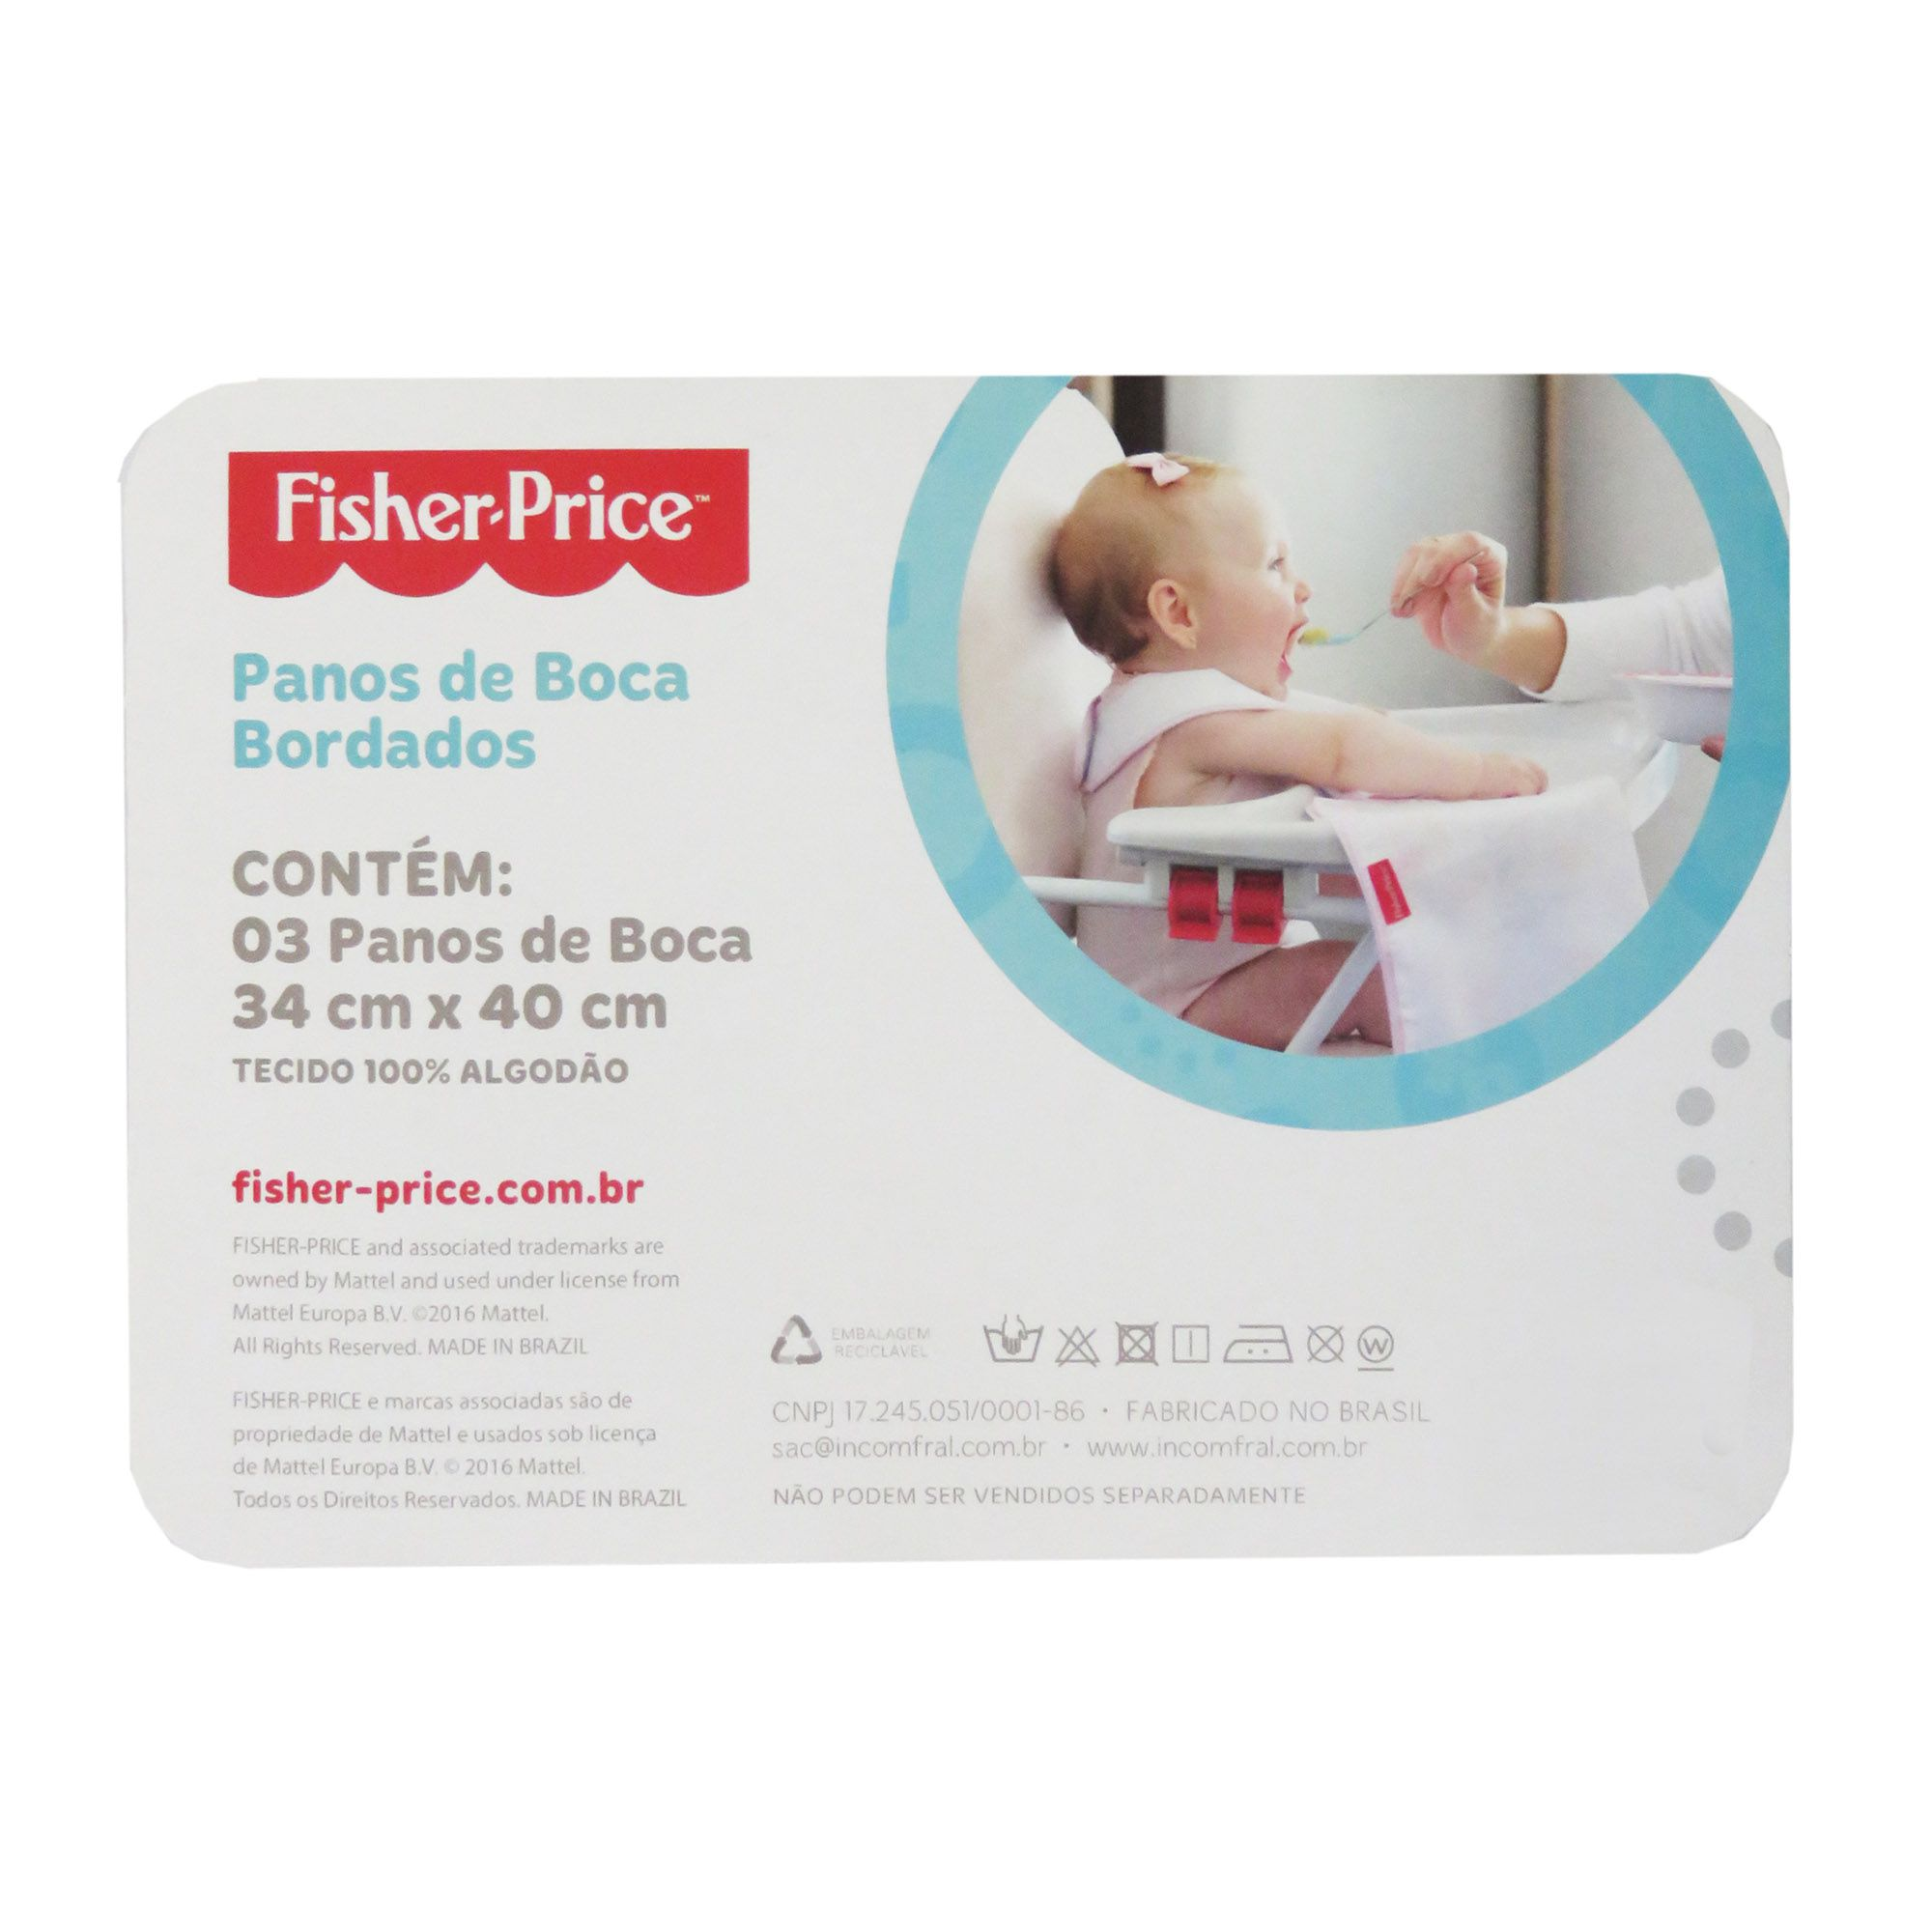 Pano de Boca Incomfral Fisher-Price – Estampado - Azul Claro